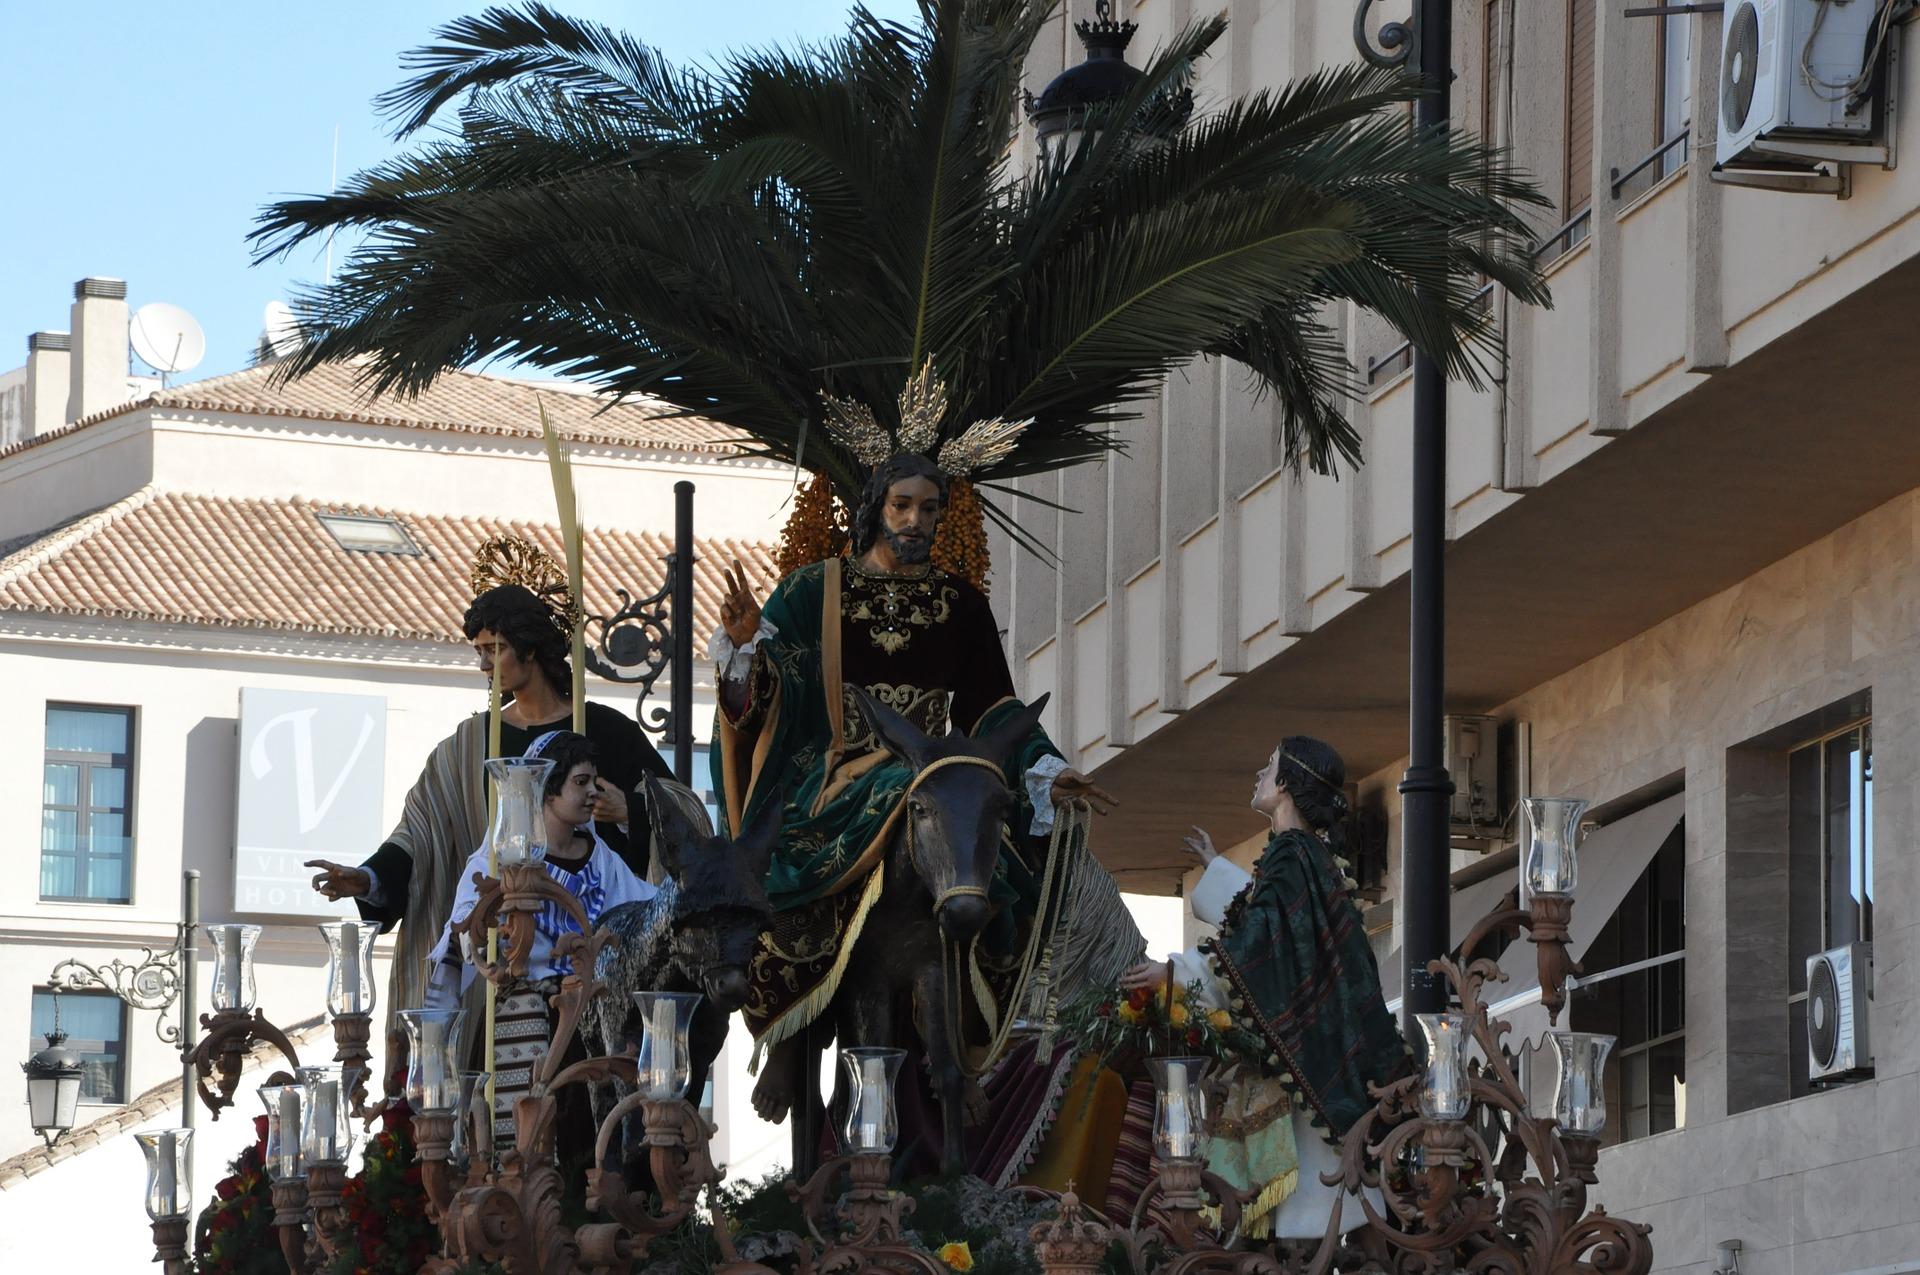 Easter procession in Malaga